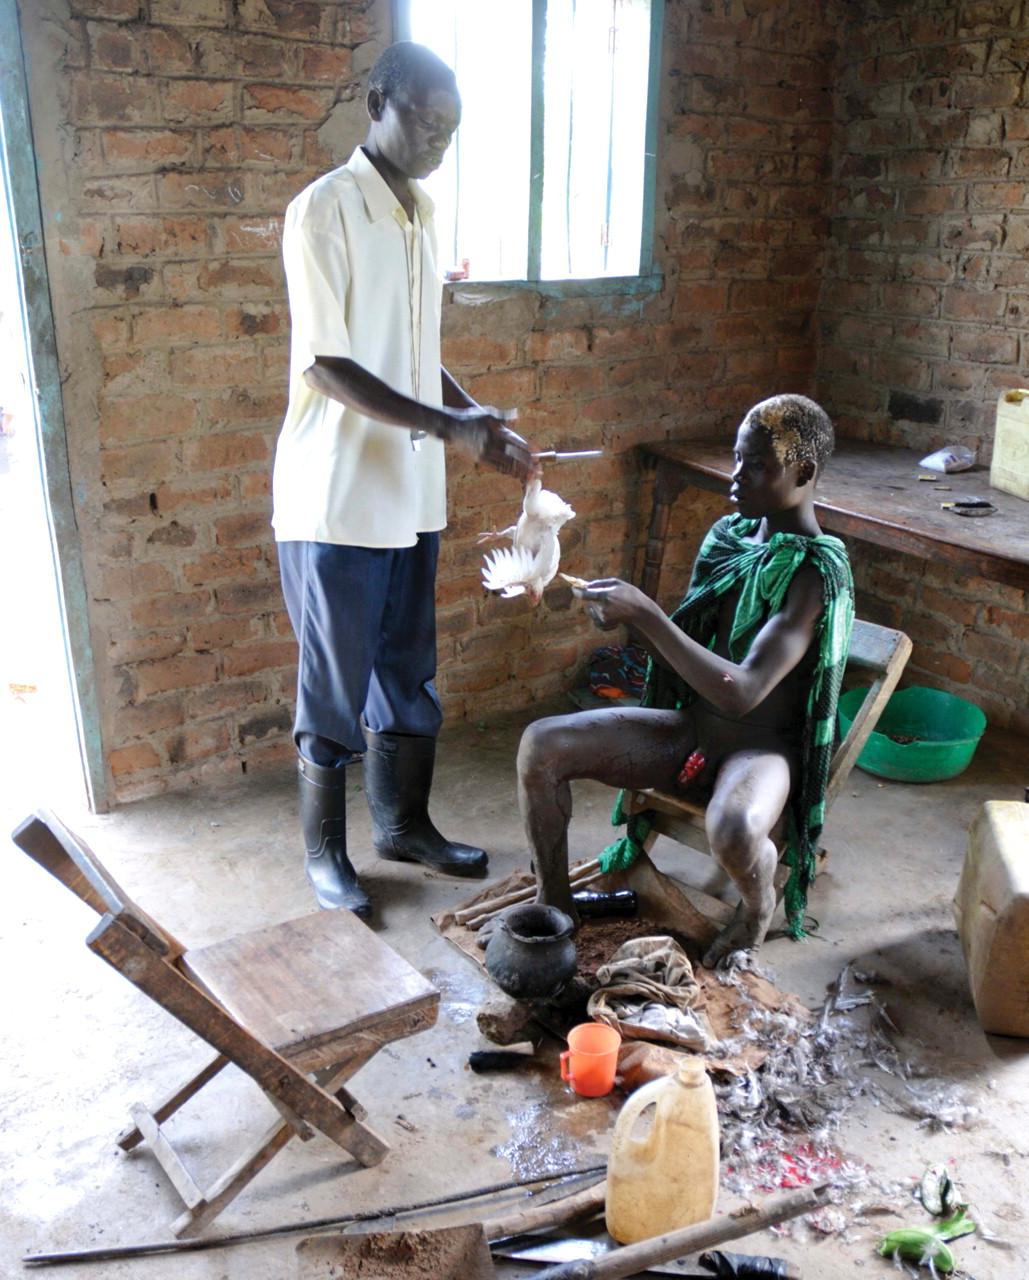 Ugandan Effort To Constrain Hiv Spread Hampered By